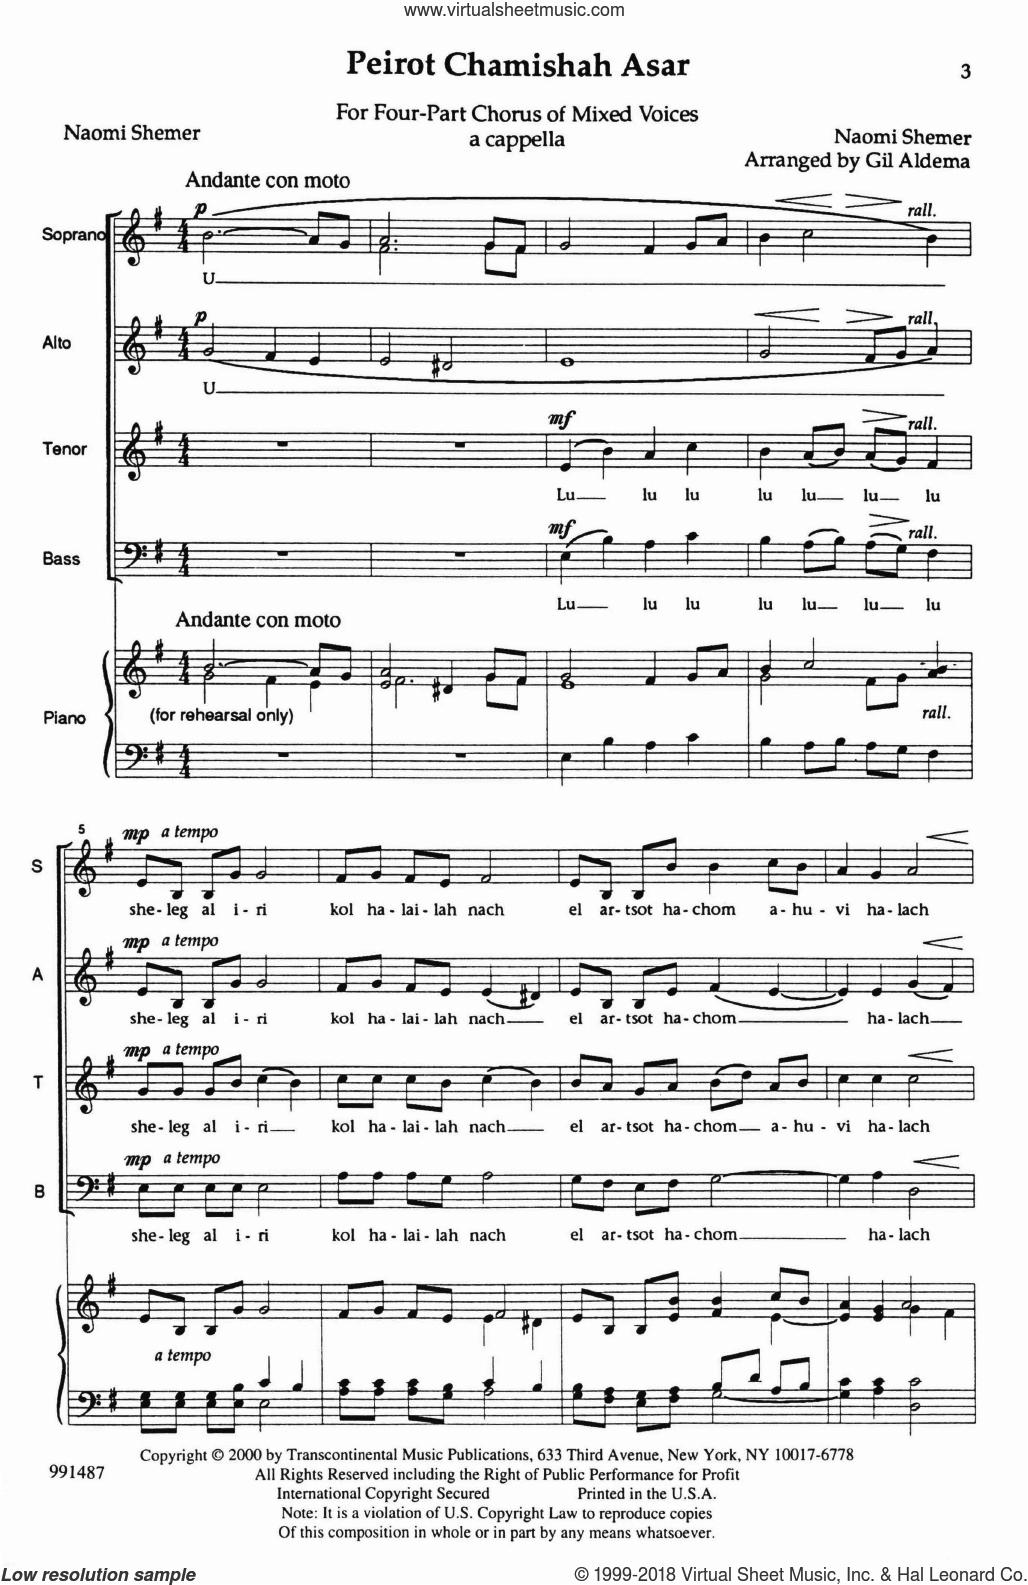 Peirot Chamishah Asar (Snow On My Town) sheet music for choir (SATB: soprano, alto, tenor, bass) by Gil Aldema and Naomi Shemer, intermediate skill level